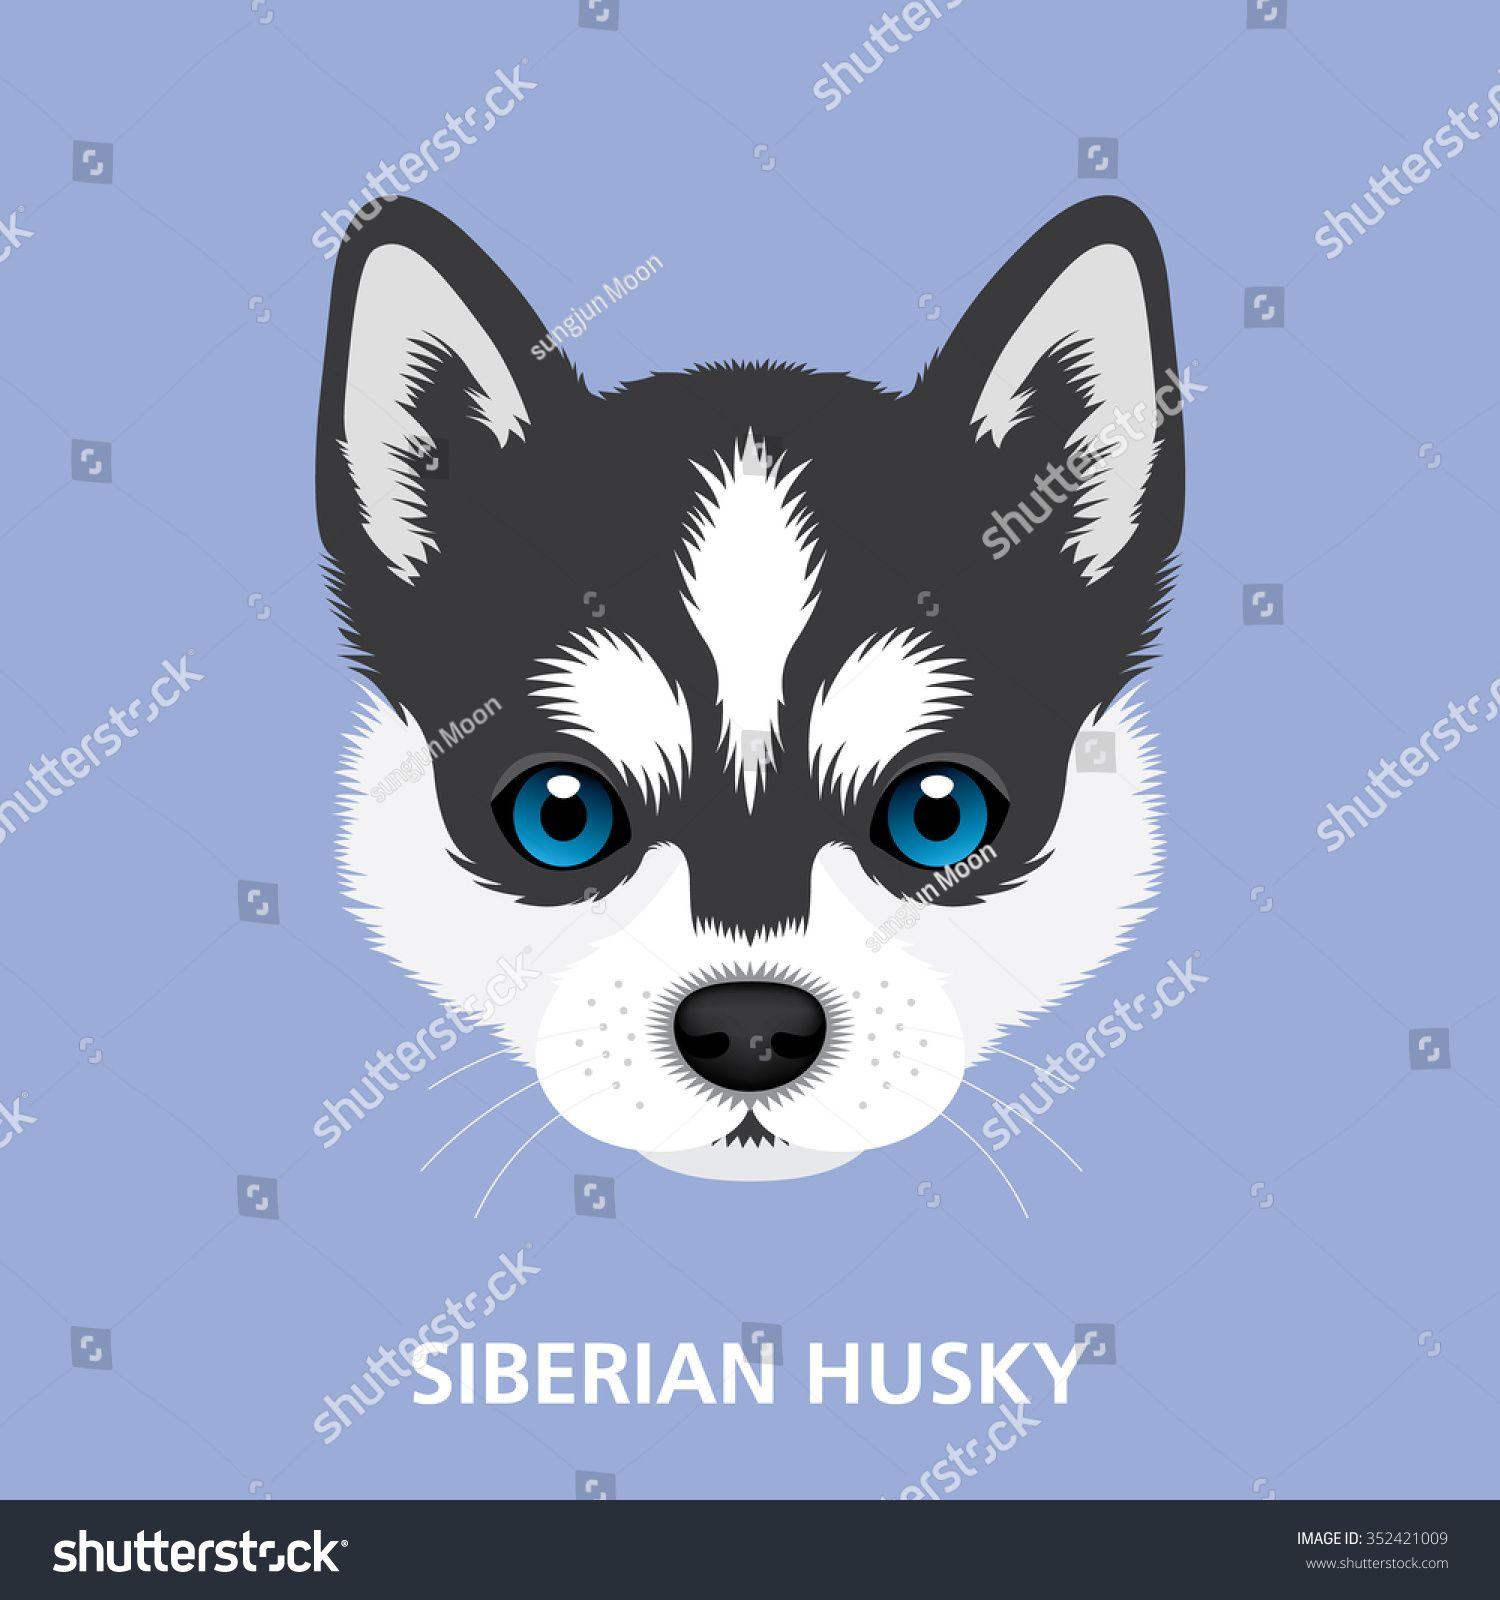 Vector Illustration Portrait Of Siberian Husky Puppy Art Of Dog